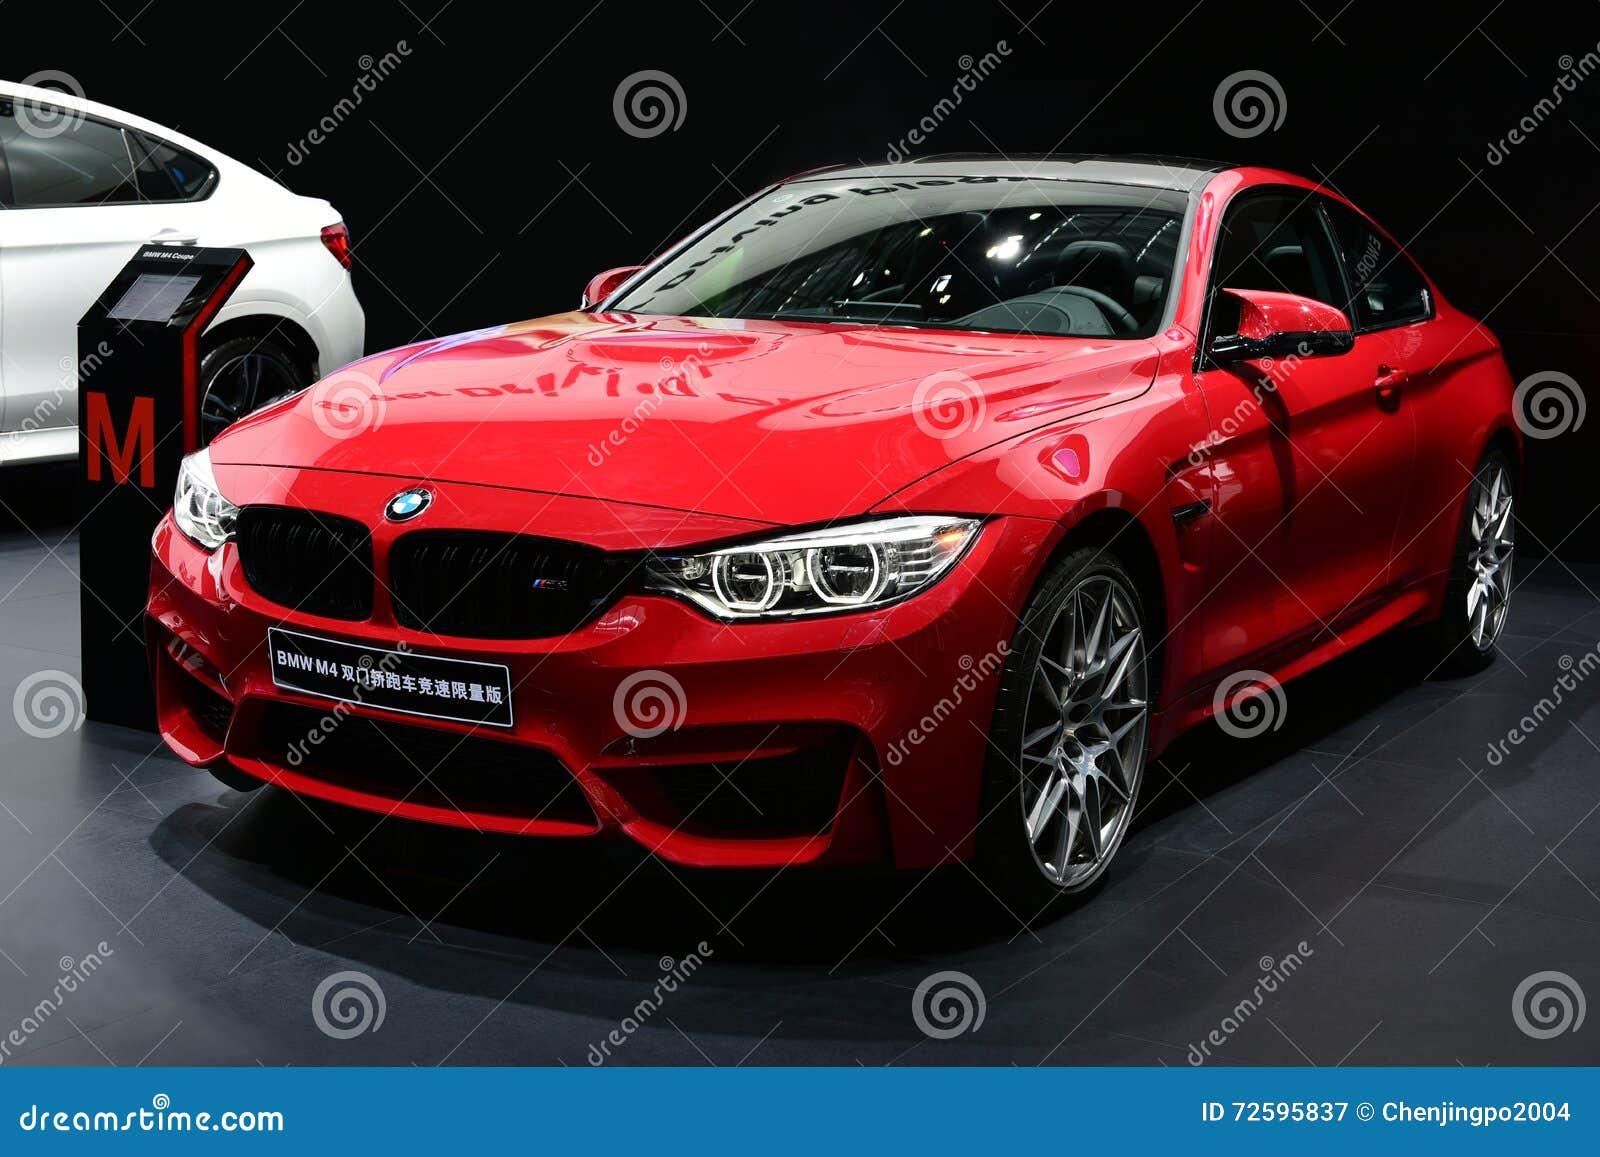 une voiture rouge de bmw m4 photographie ditorial image du luxe transport 72595837. Black Bedroom Furniture Sets. Home Design Ideas